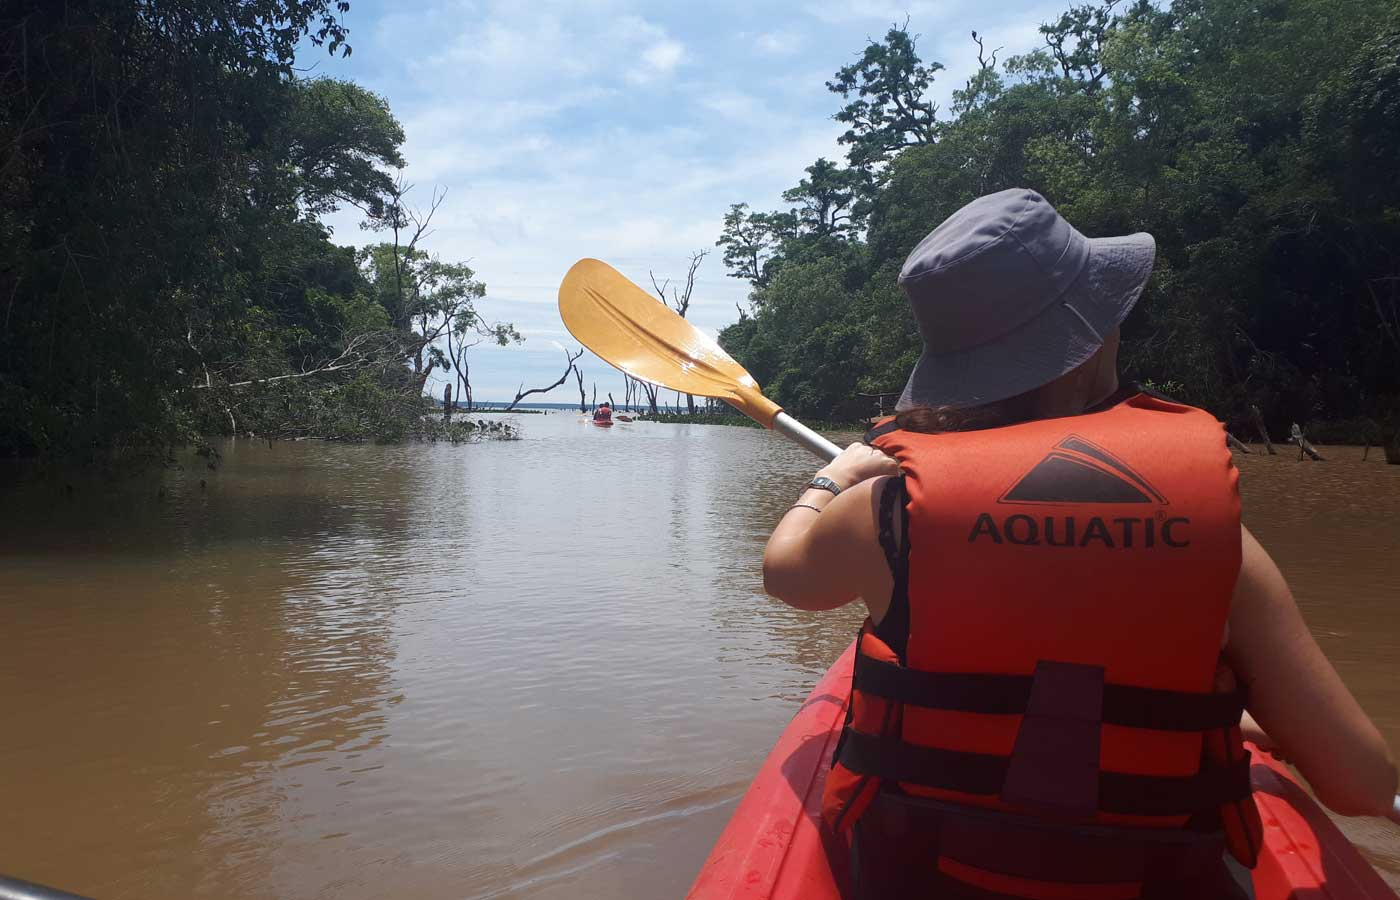 Kayaking in the Ibera Wetlands, Argentina